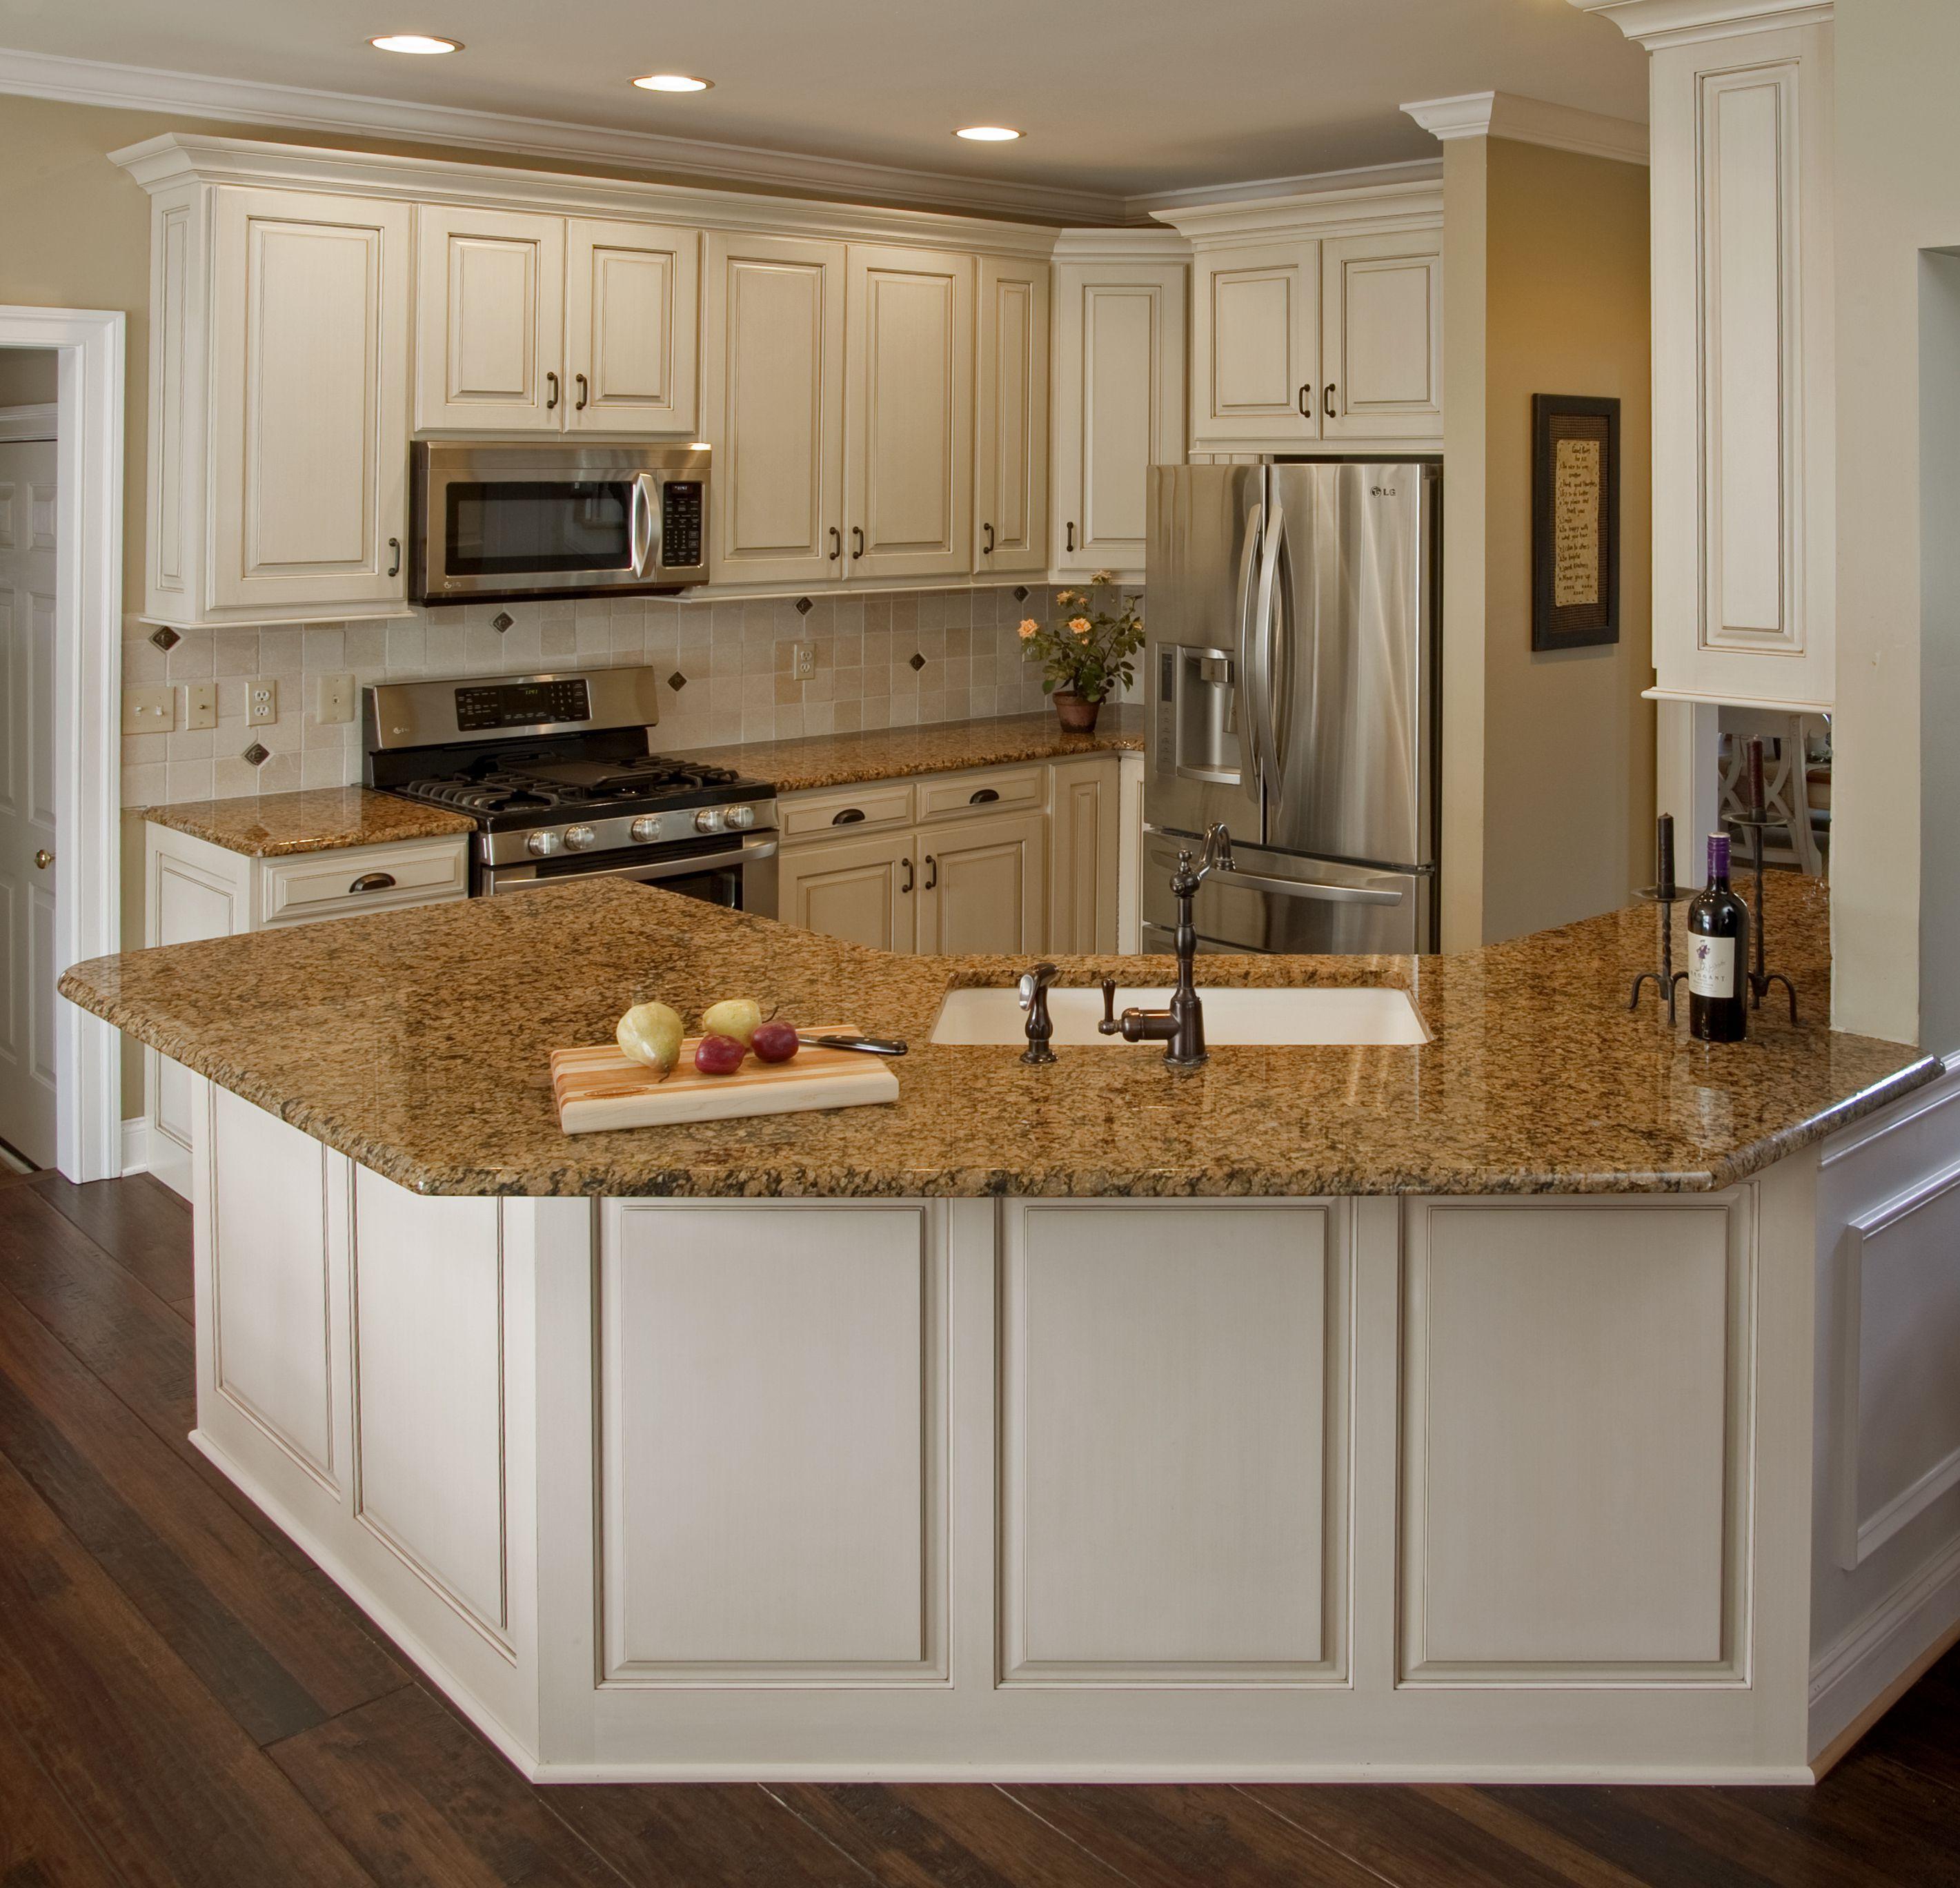 kitchen cabinet facelift ideas photo - 9